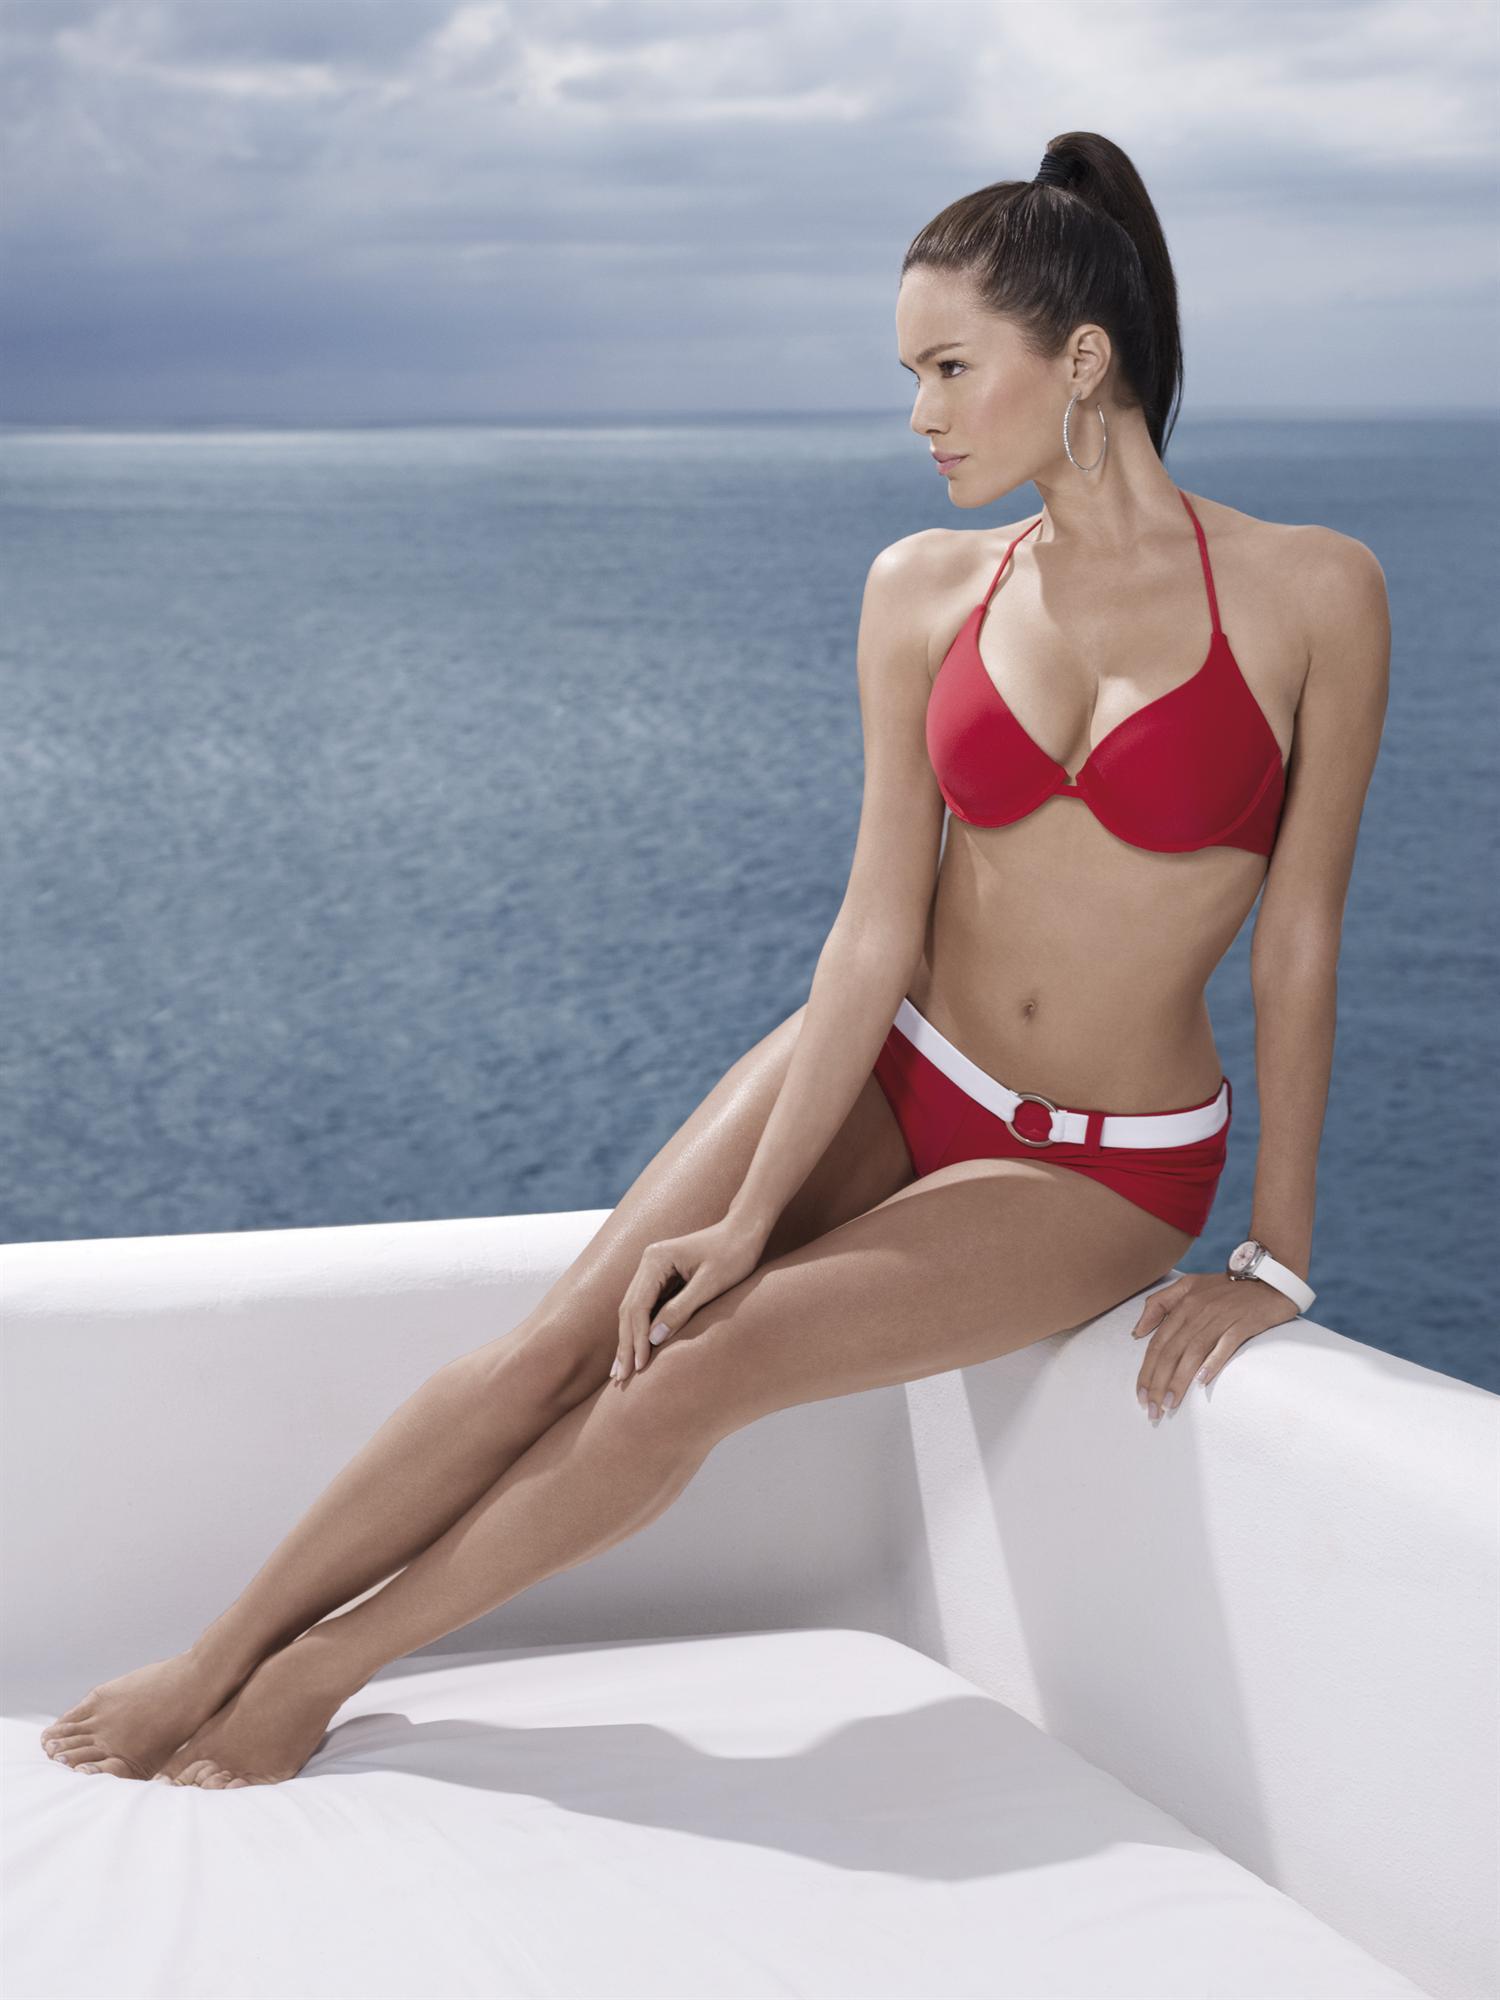 Tal Berkovich in a bikini